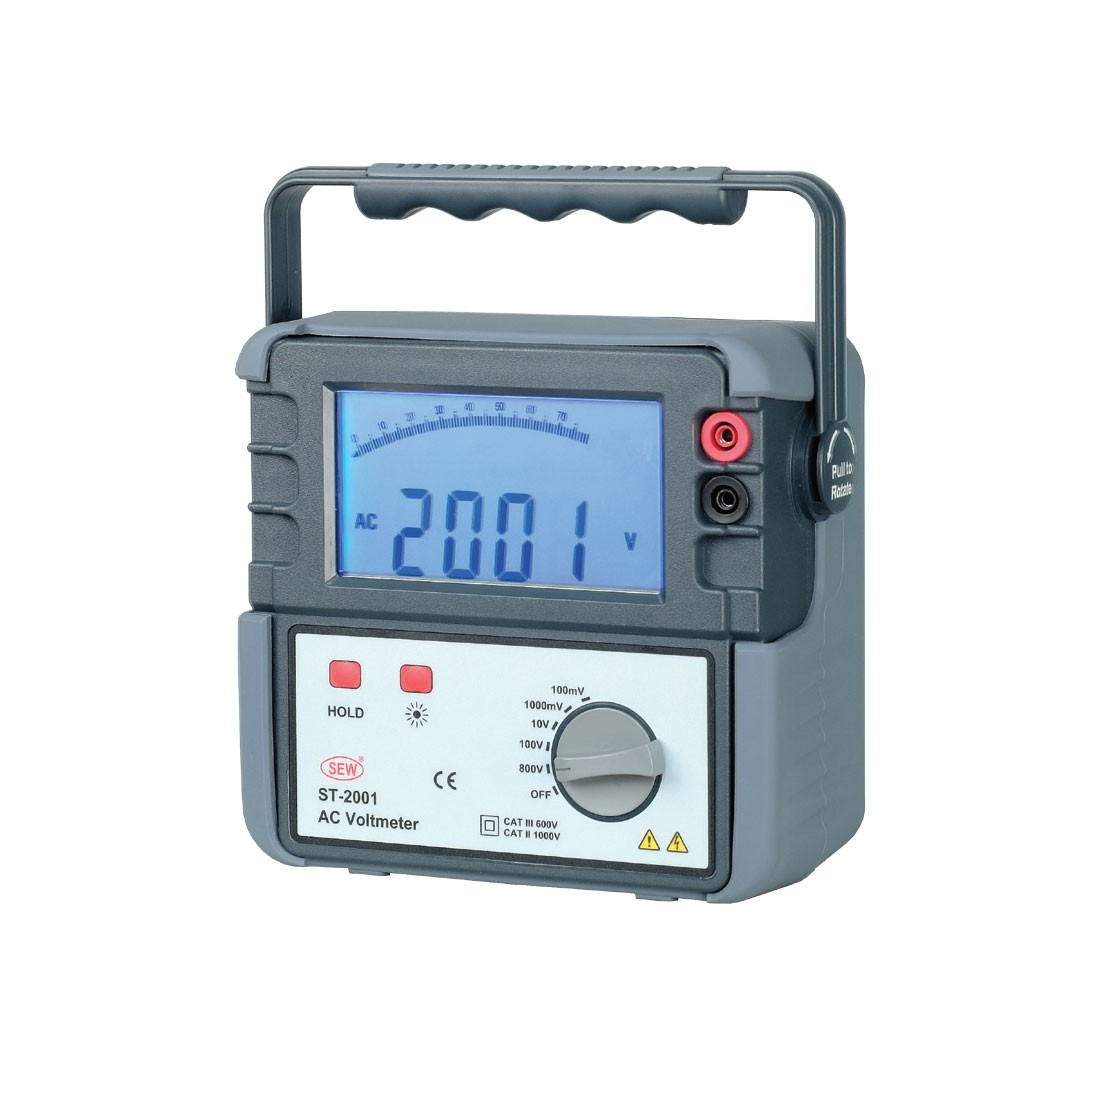 ST-2001ACV Large Digit Portable AC Multimeter